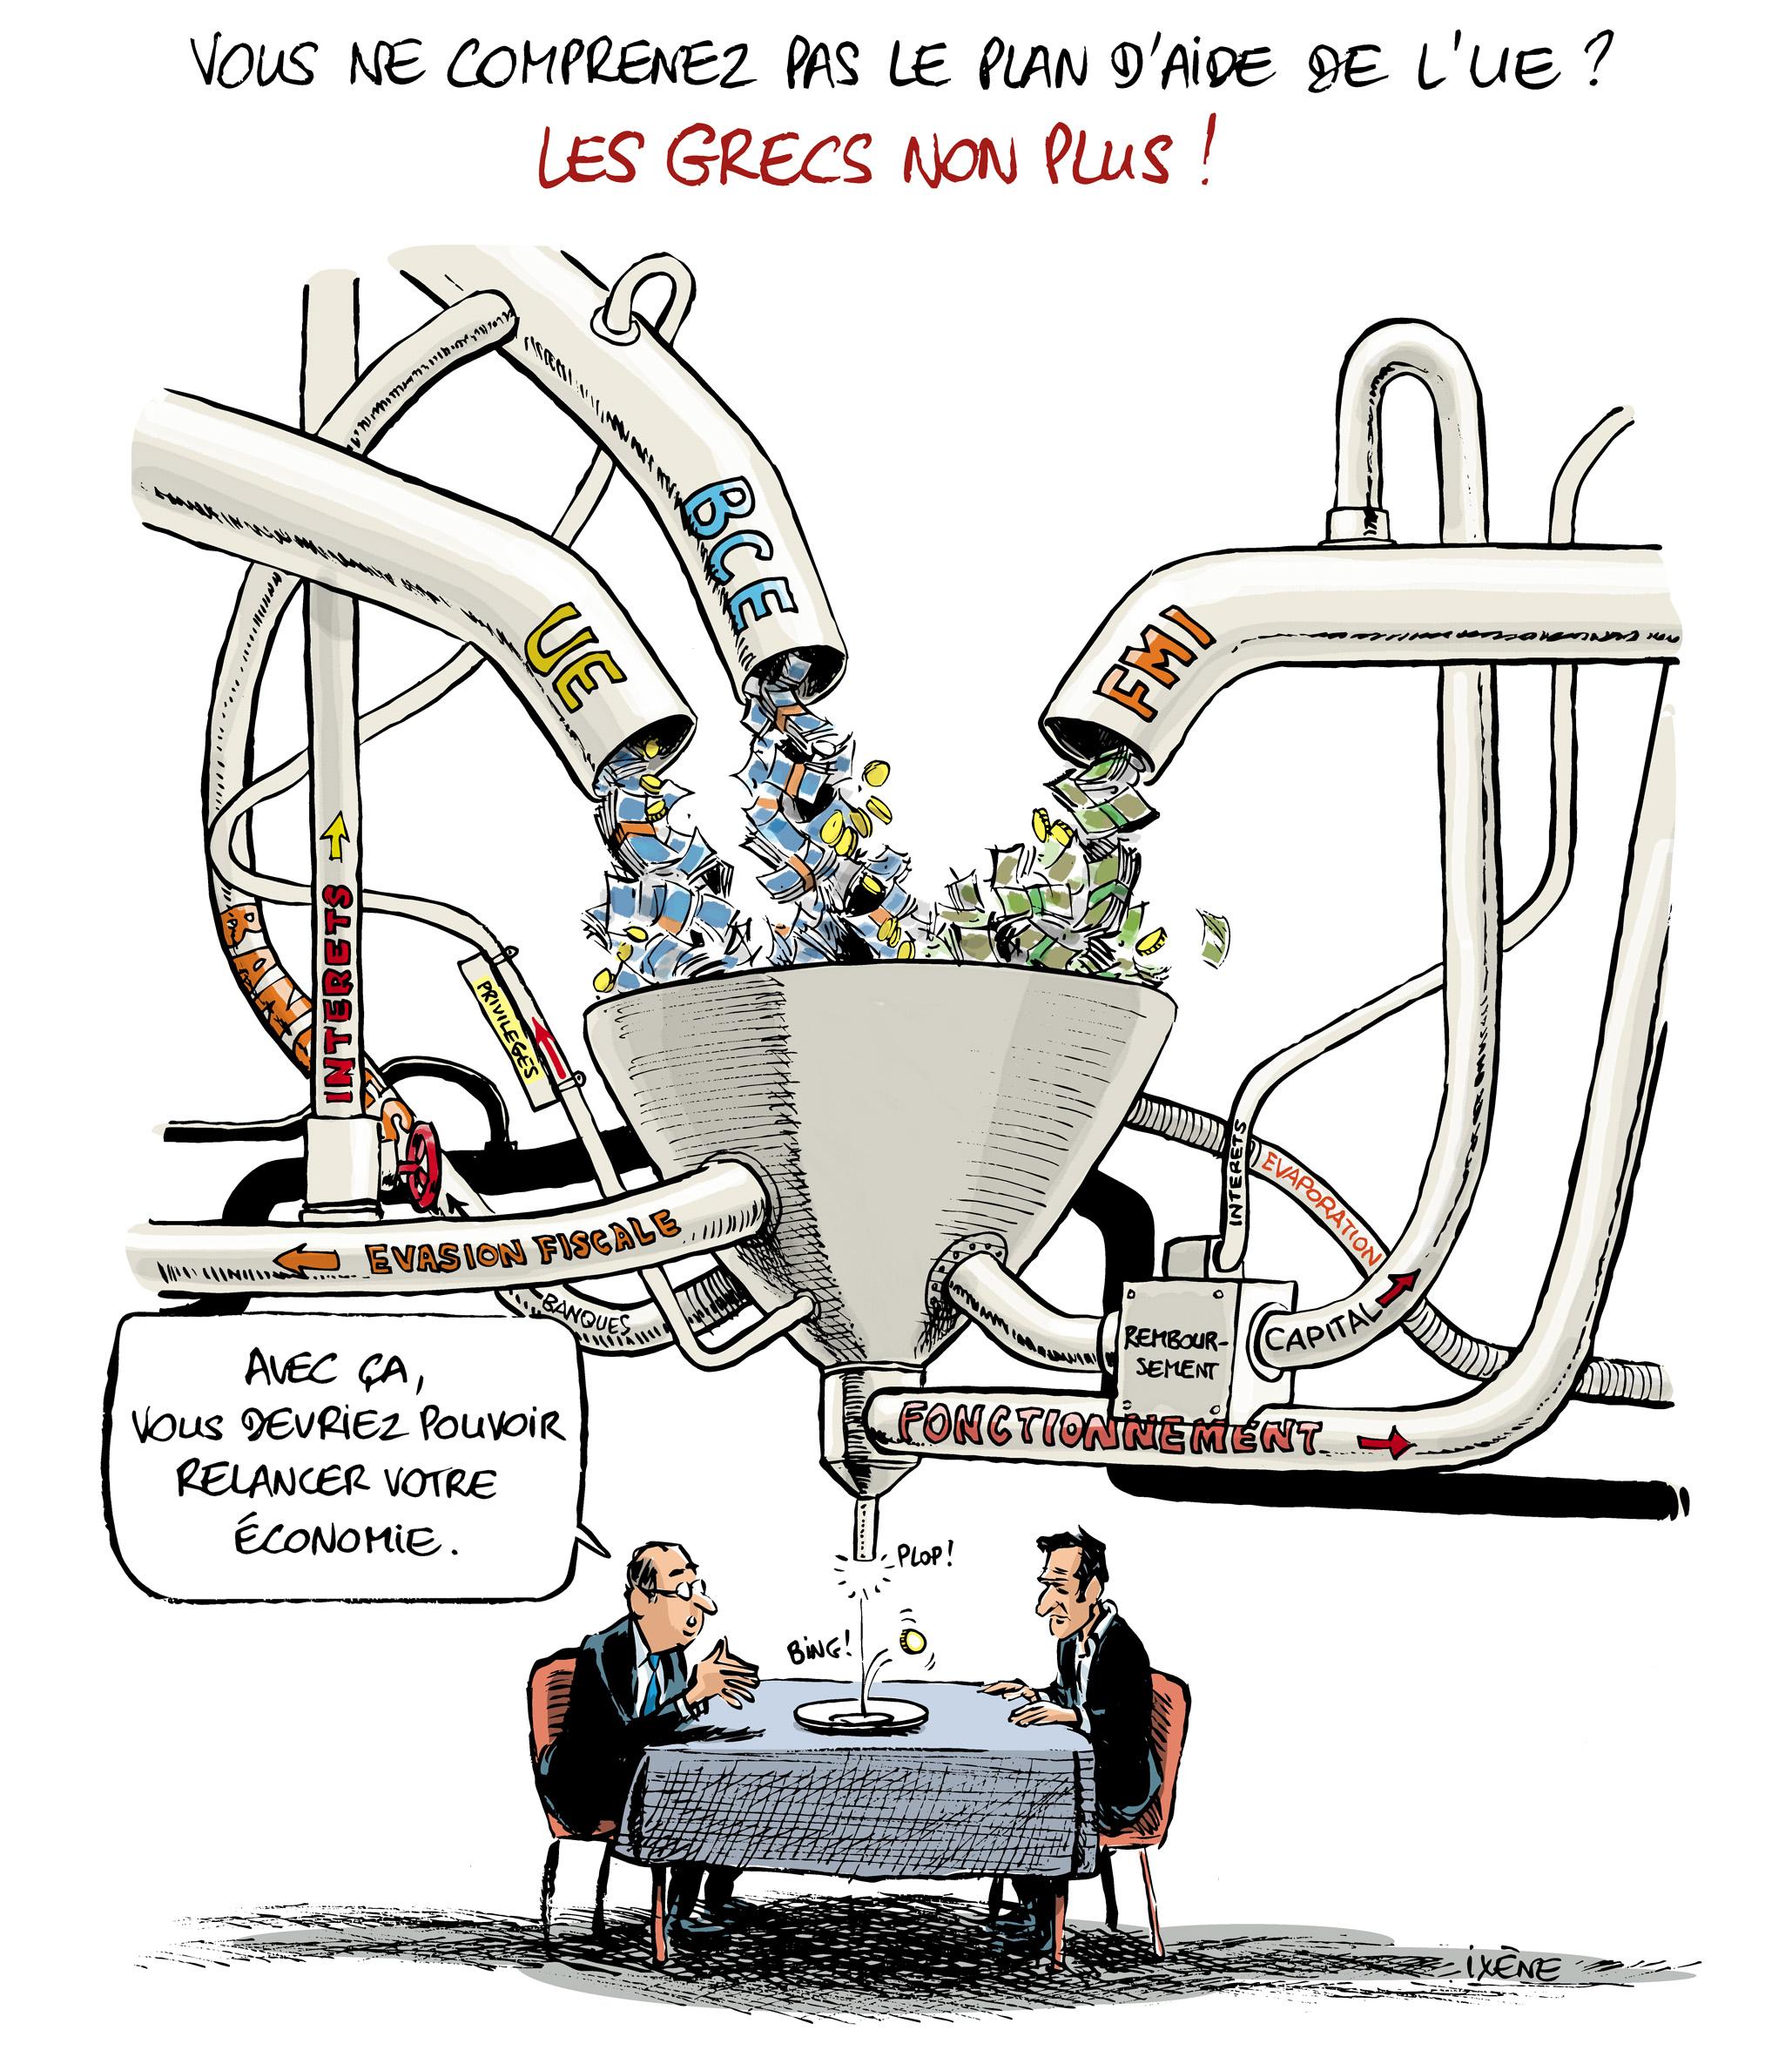 Ixene Accord UE-Grece titre